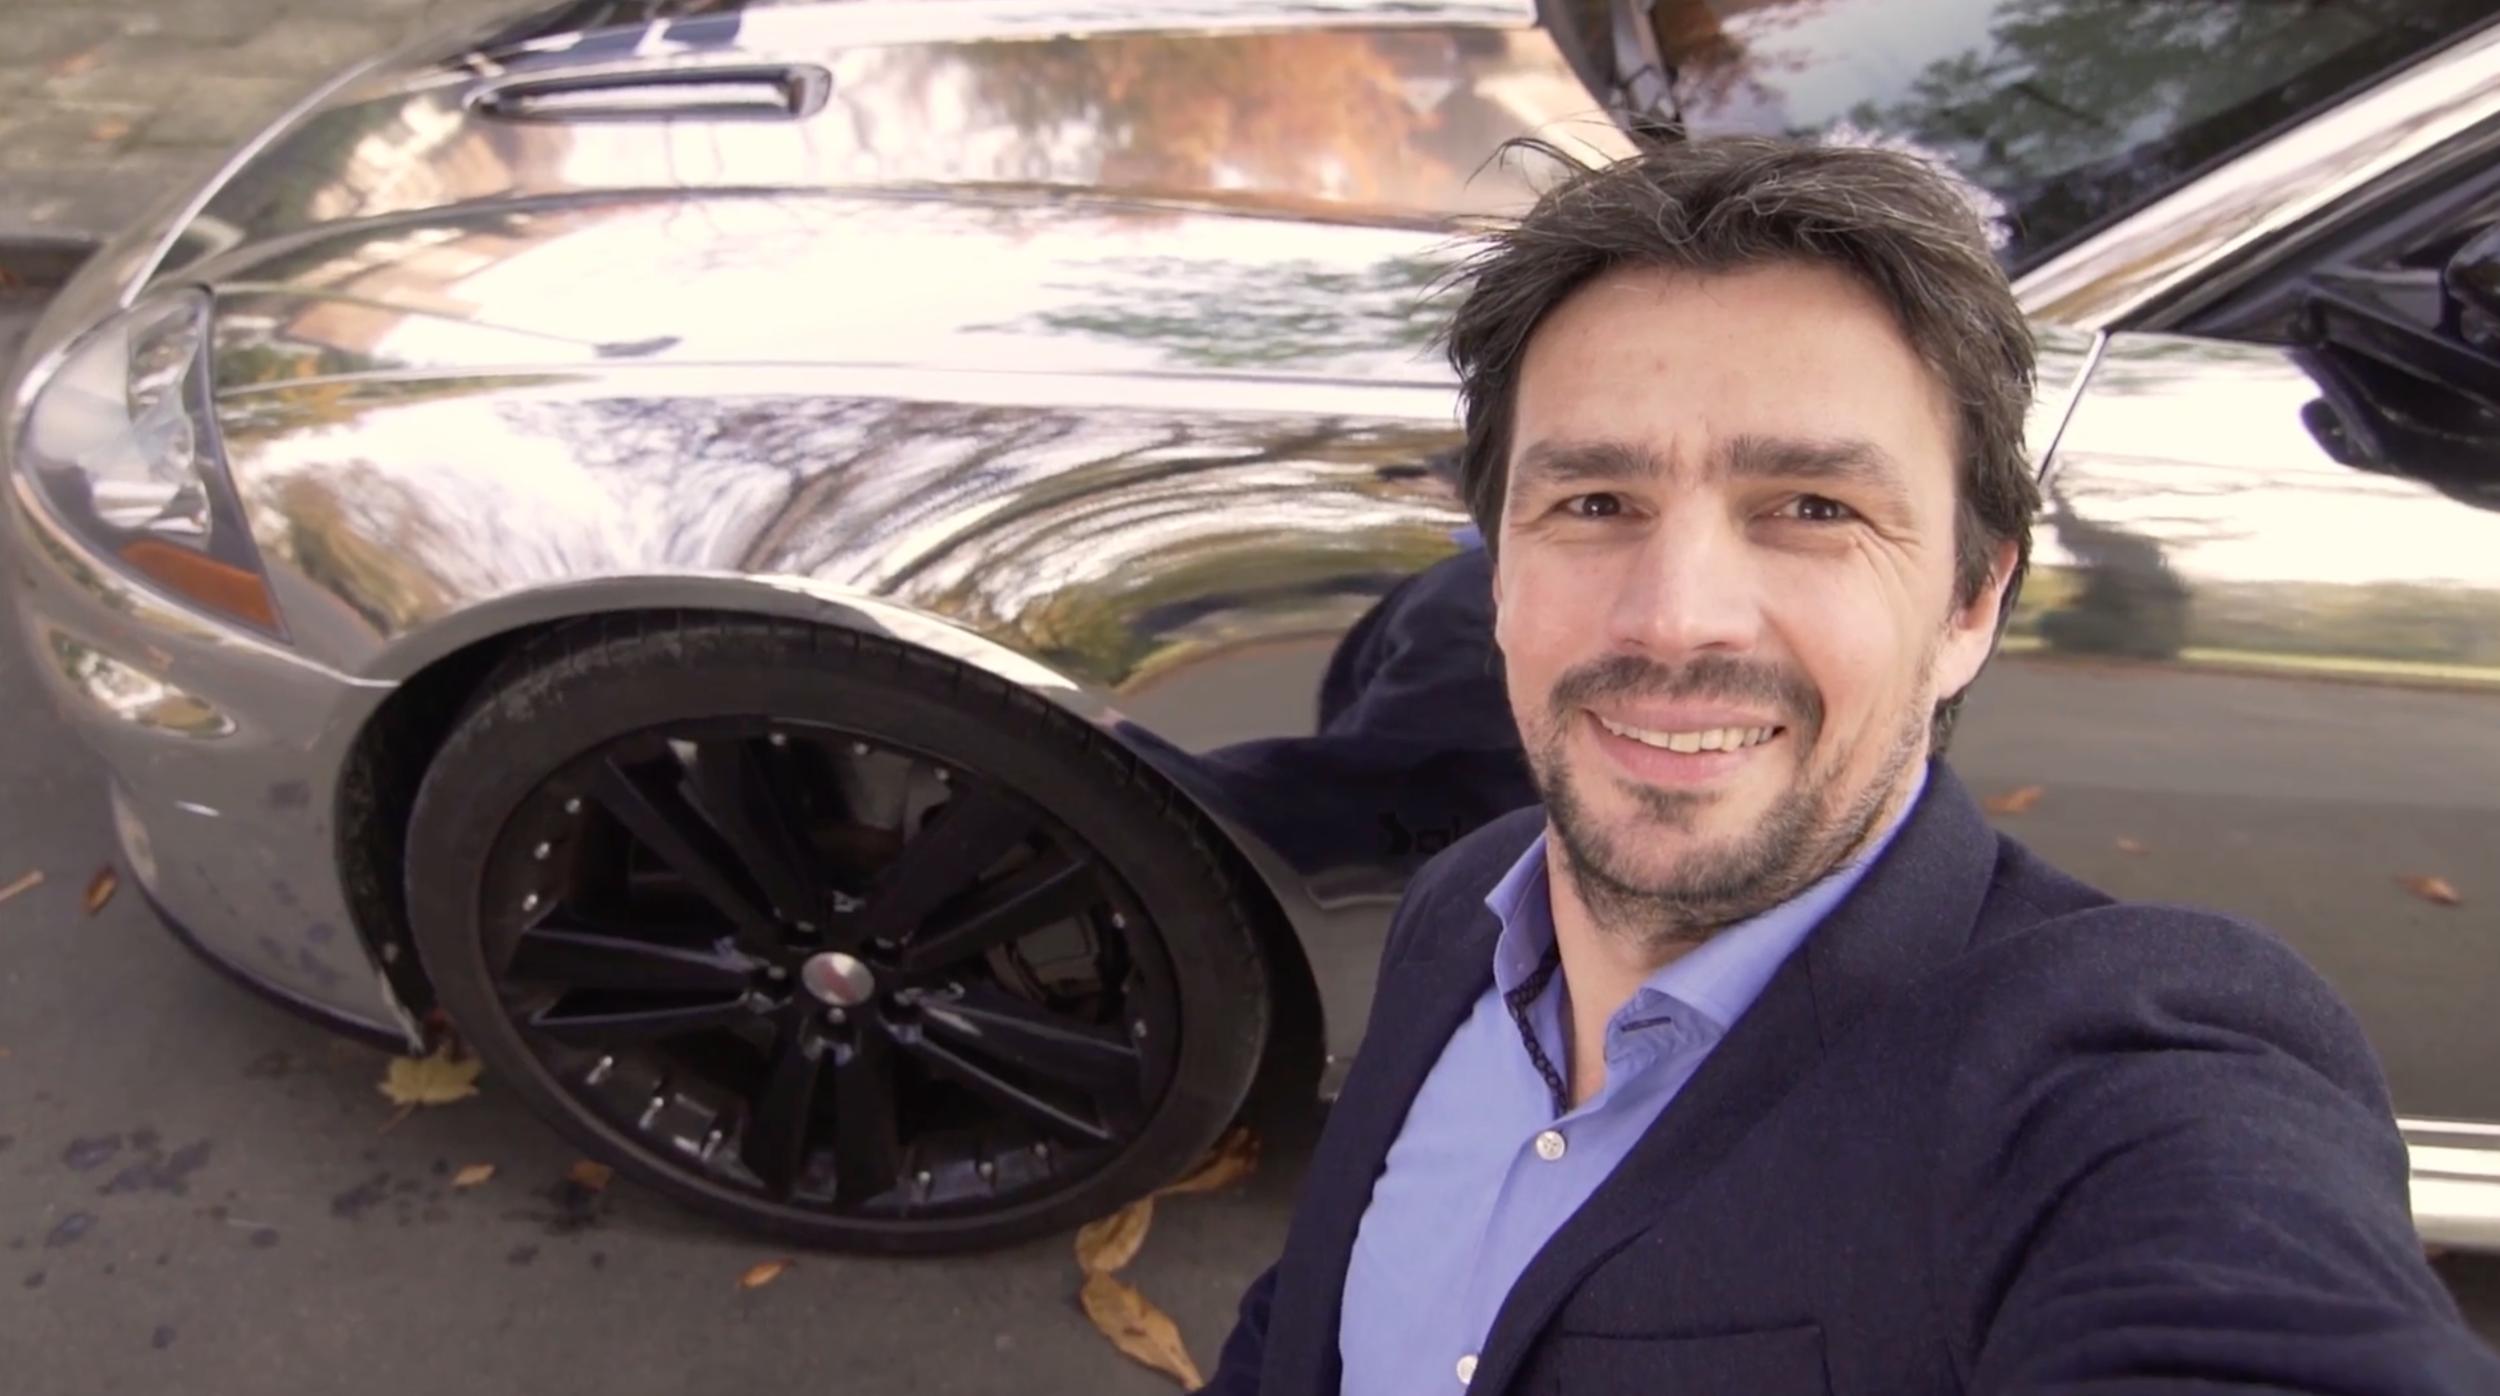 🚘 #DreamCar - video